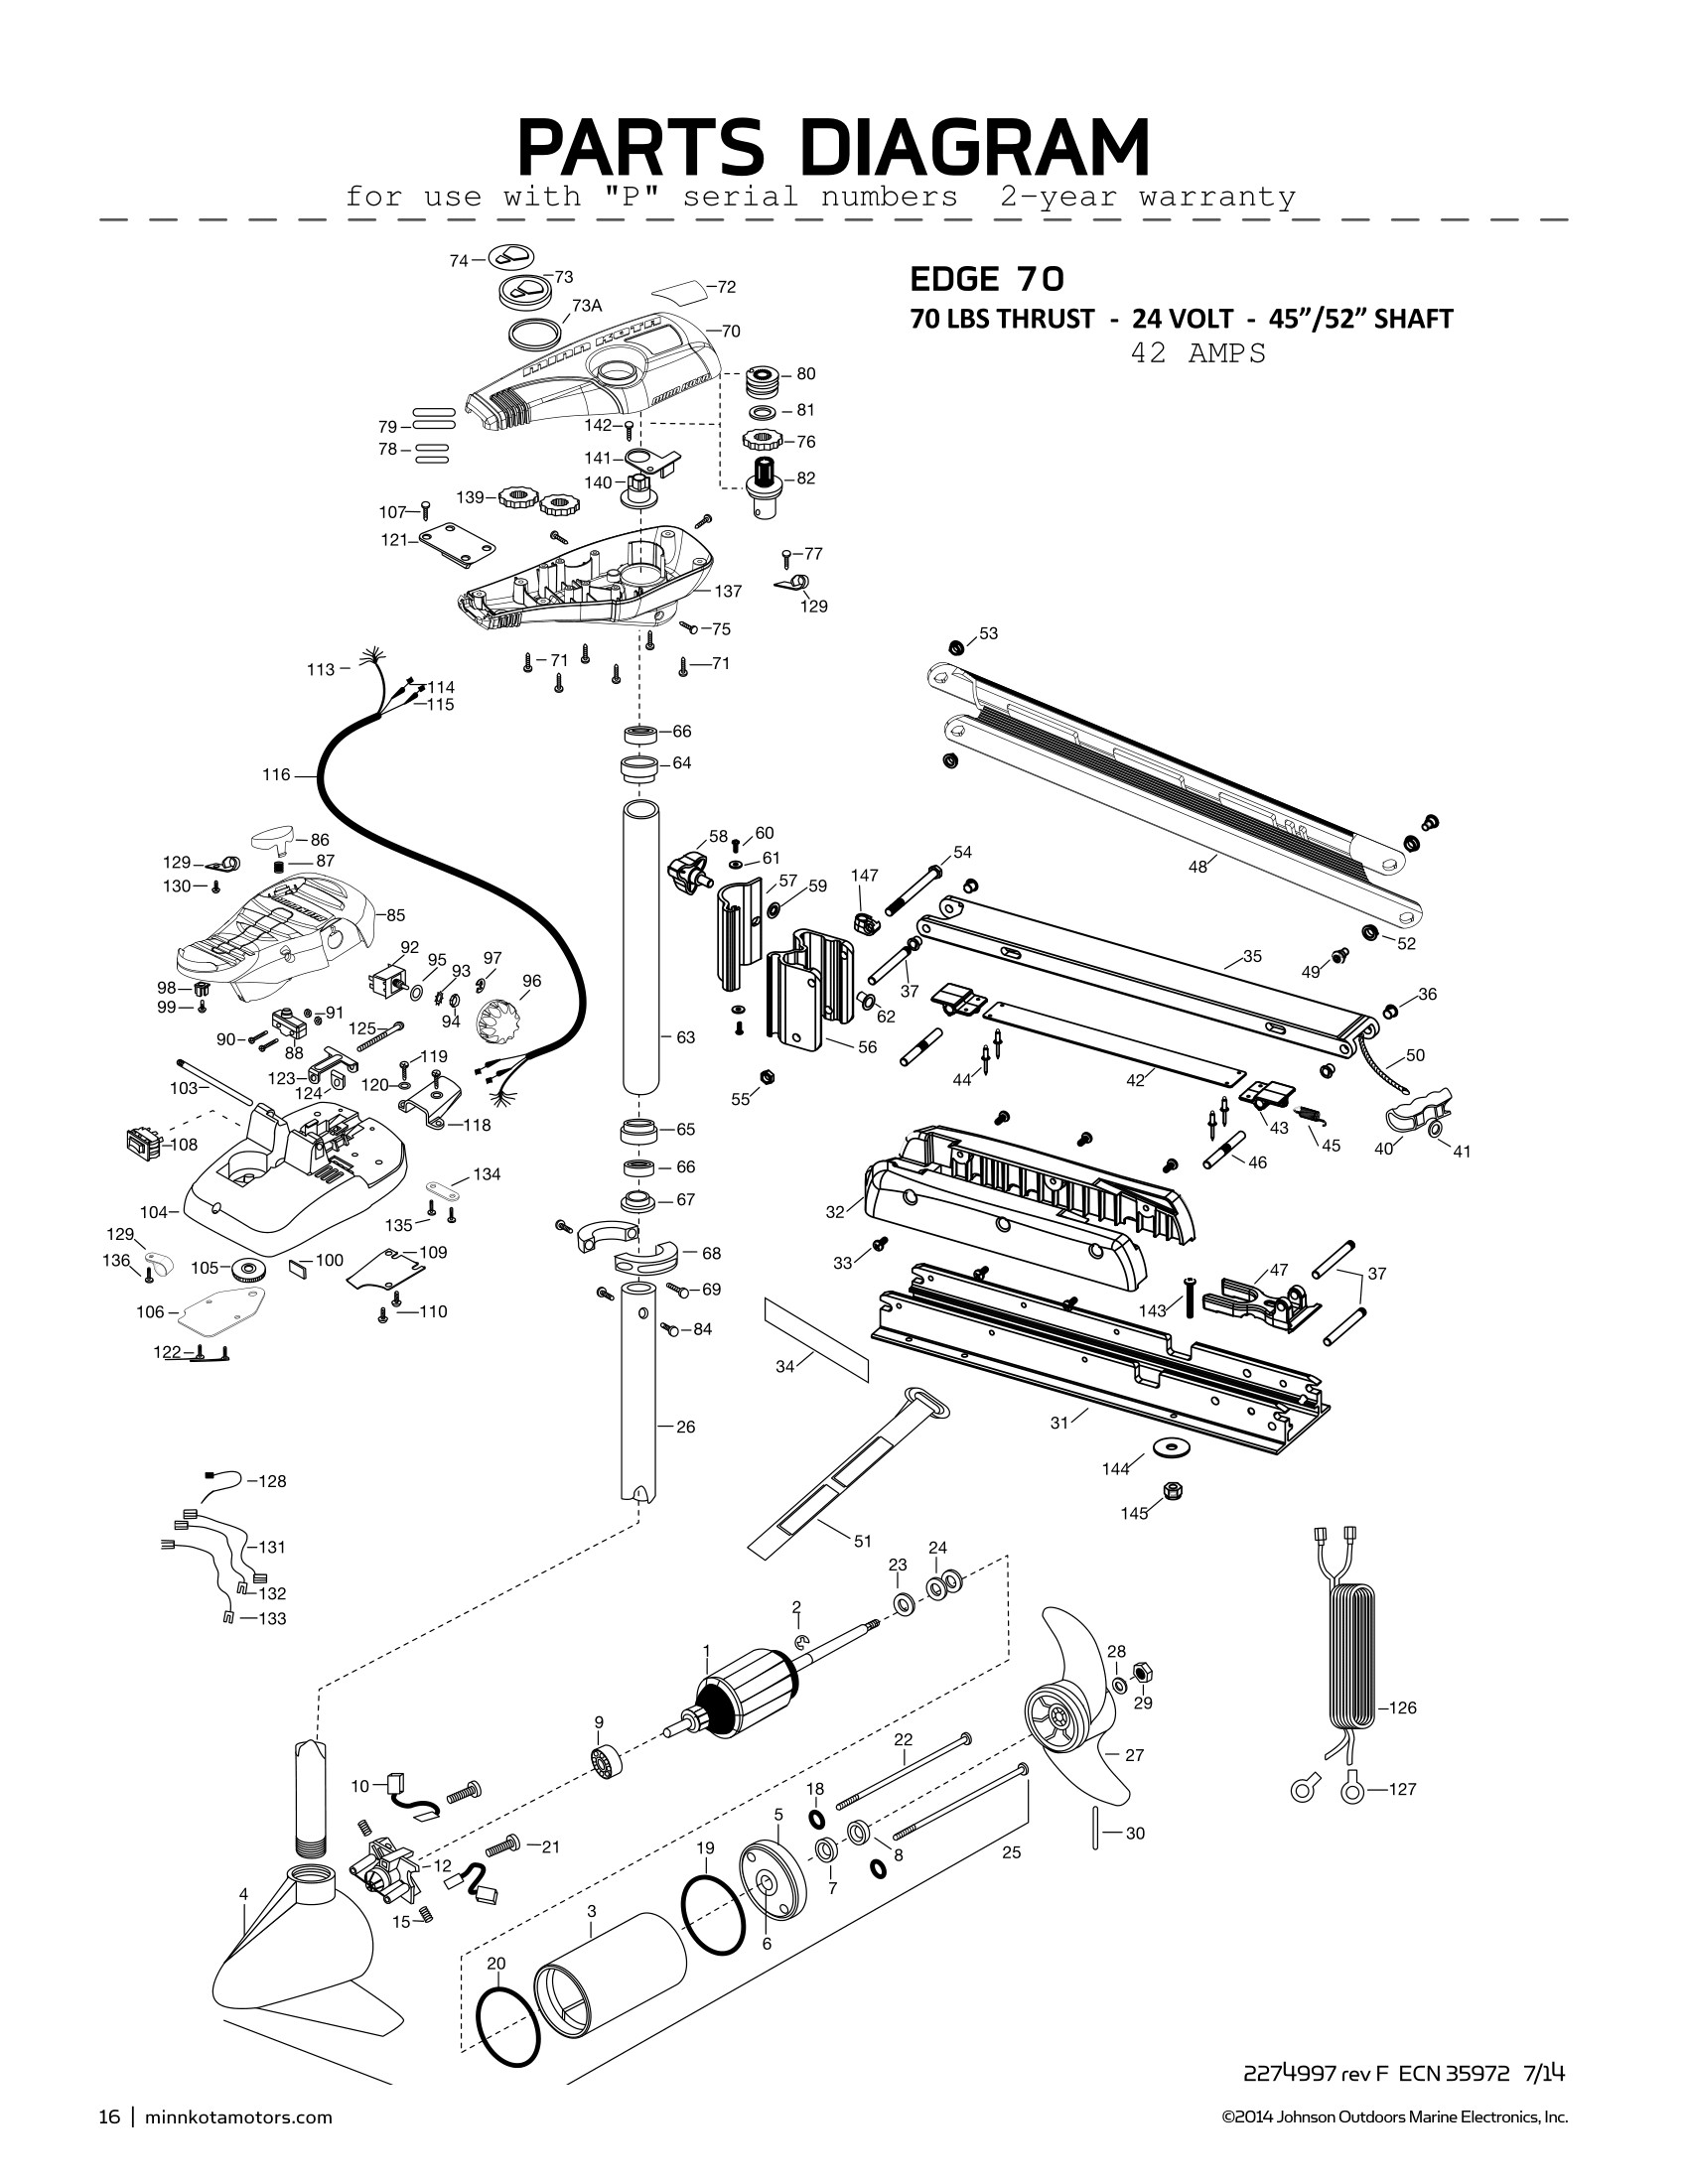 Electric Motor Parts Diagram Minn Kota Edge 70 Parts 2015 From Fish307 Of Electric Motor Parts Diagram Electric Motor Control Circuit Diagrams Motor Repalcement Parts and